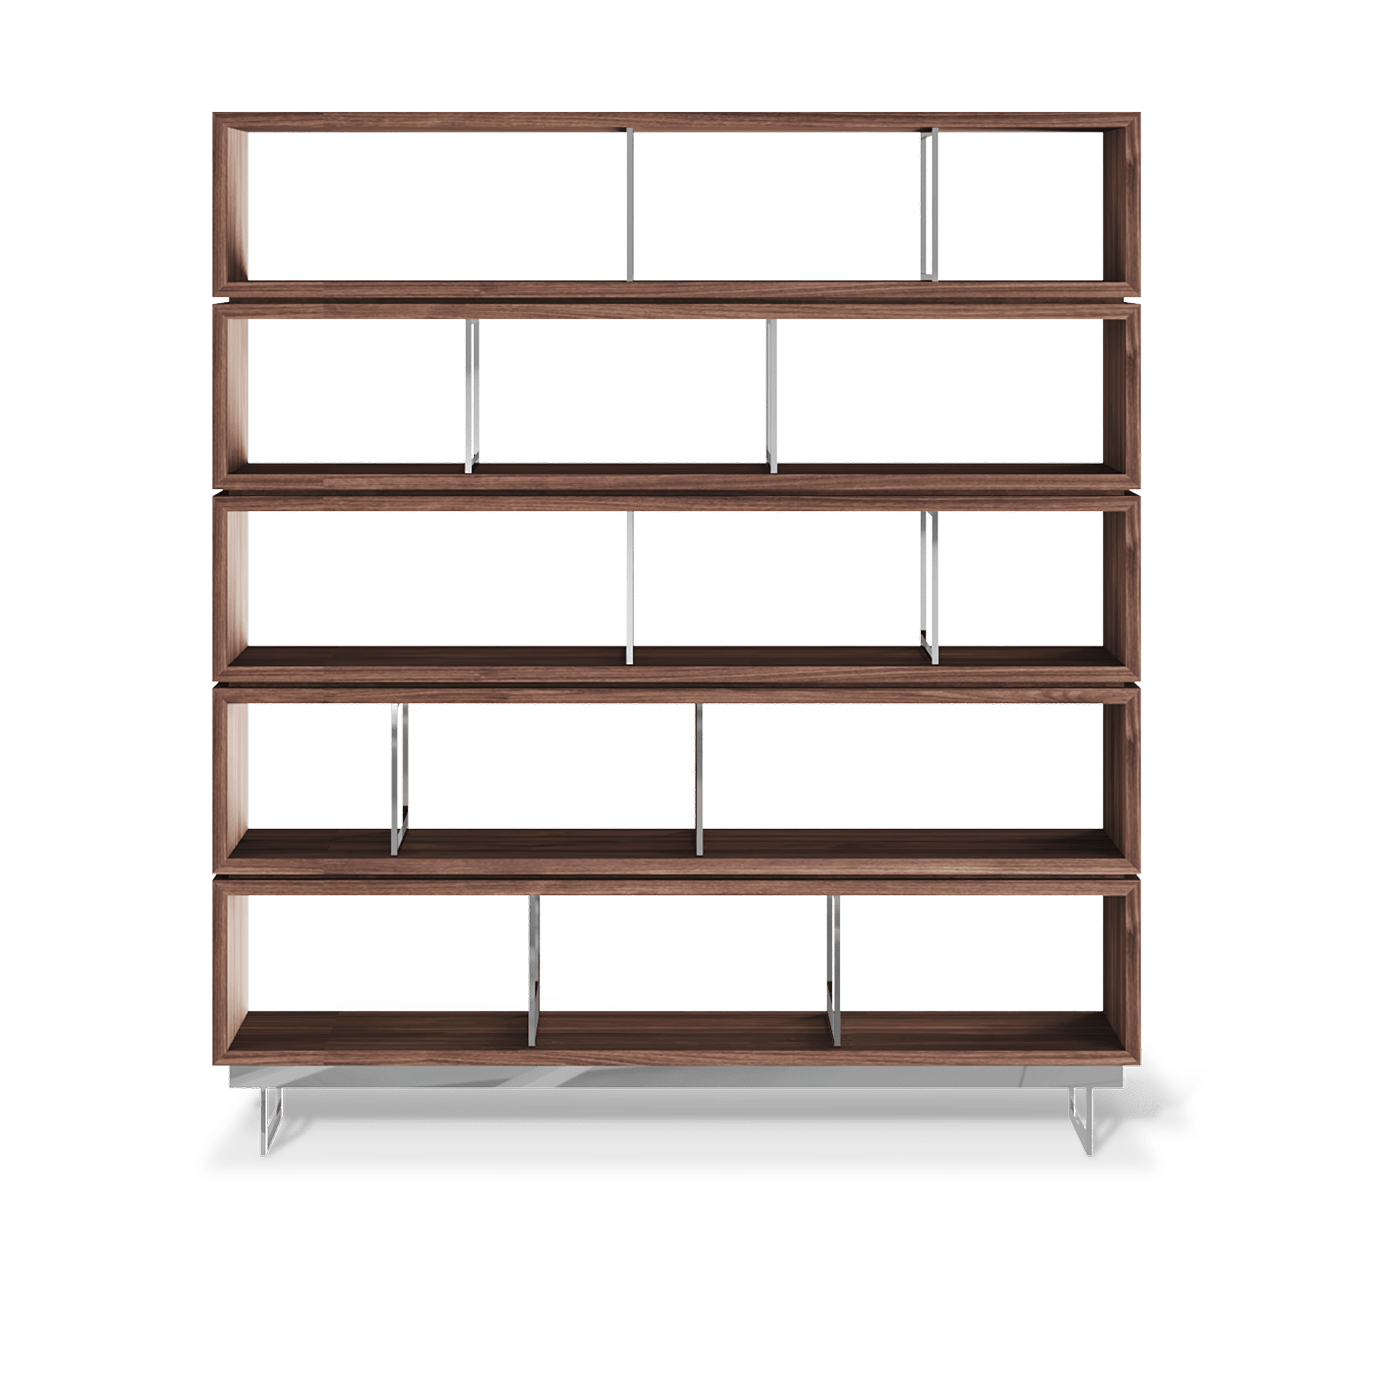 Horizontal Shelf